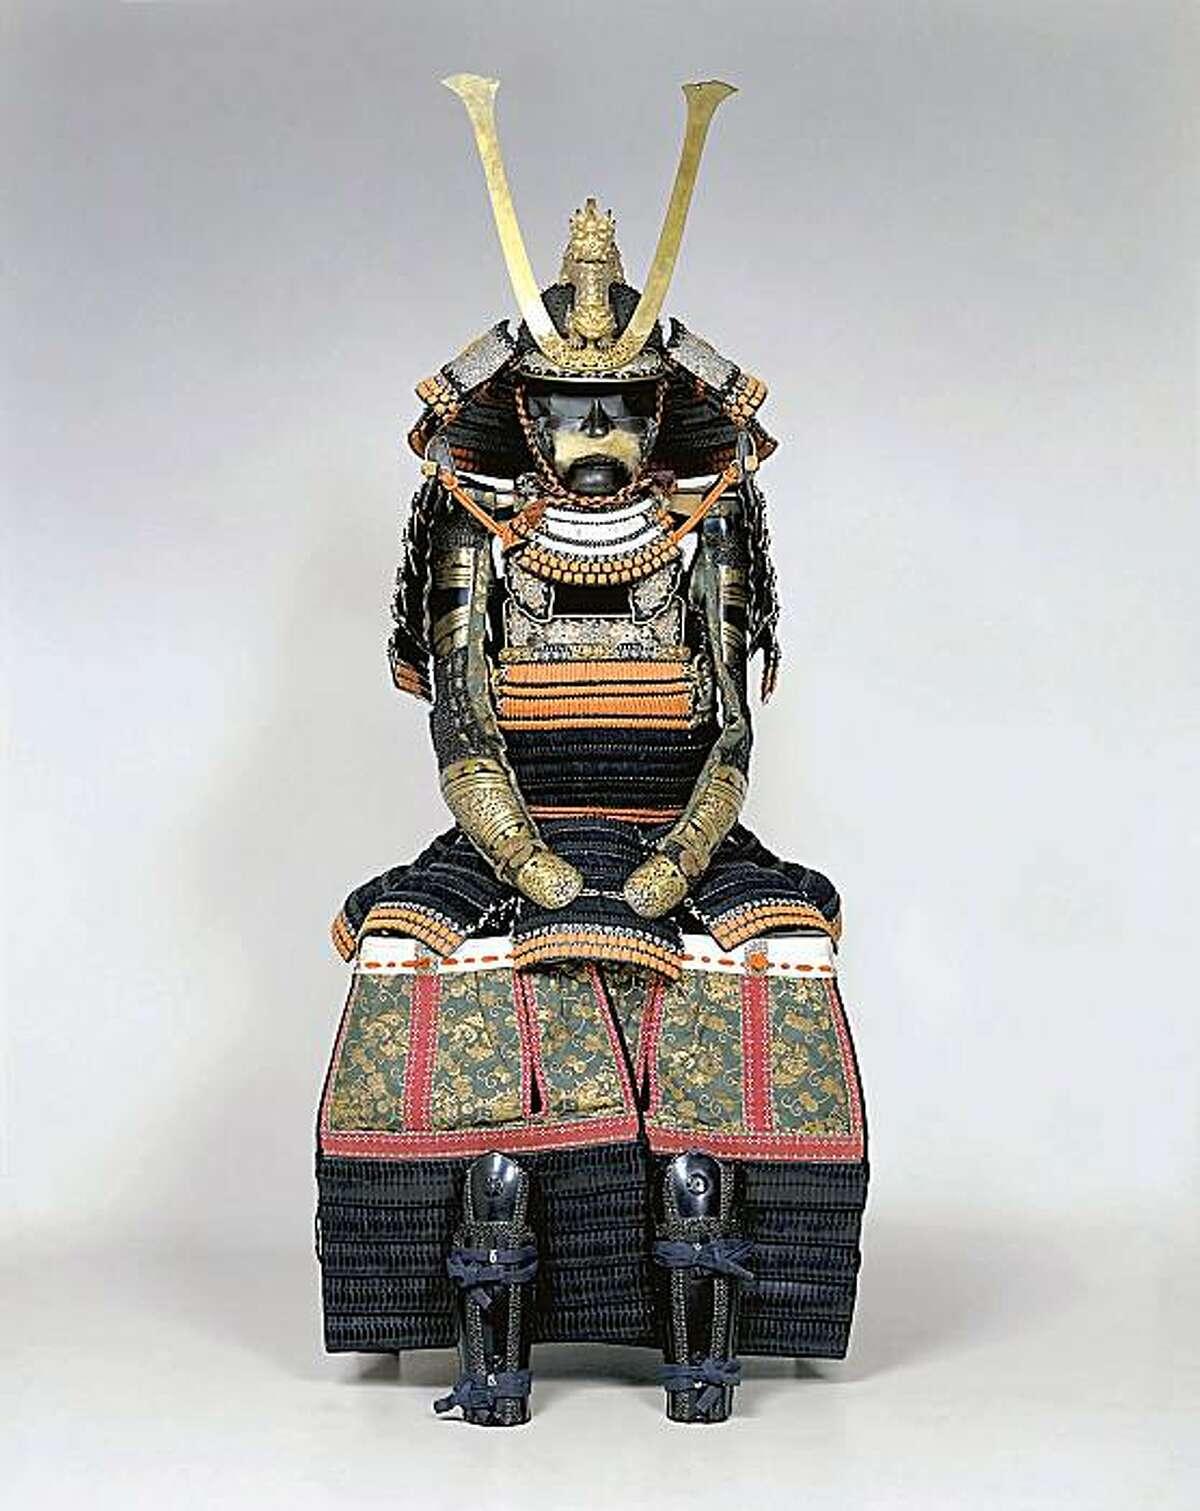 A samurai's suit of armor, on exhbit as part of the Asian Art Museum's